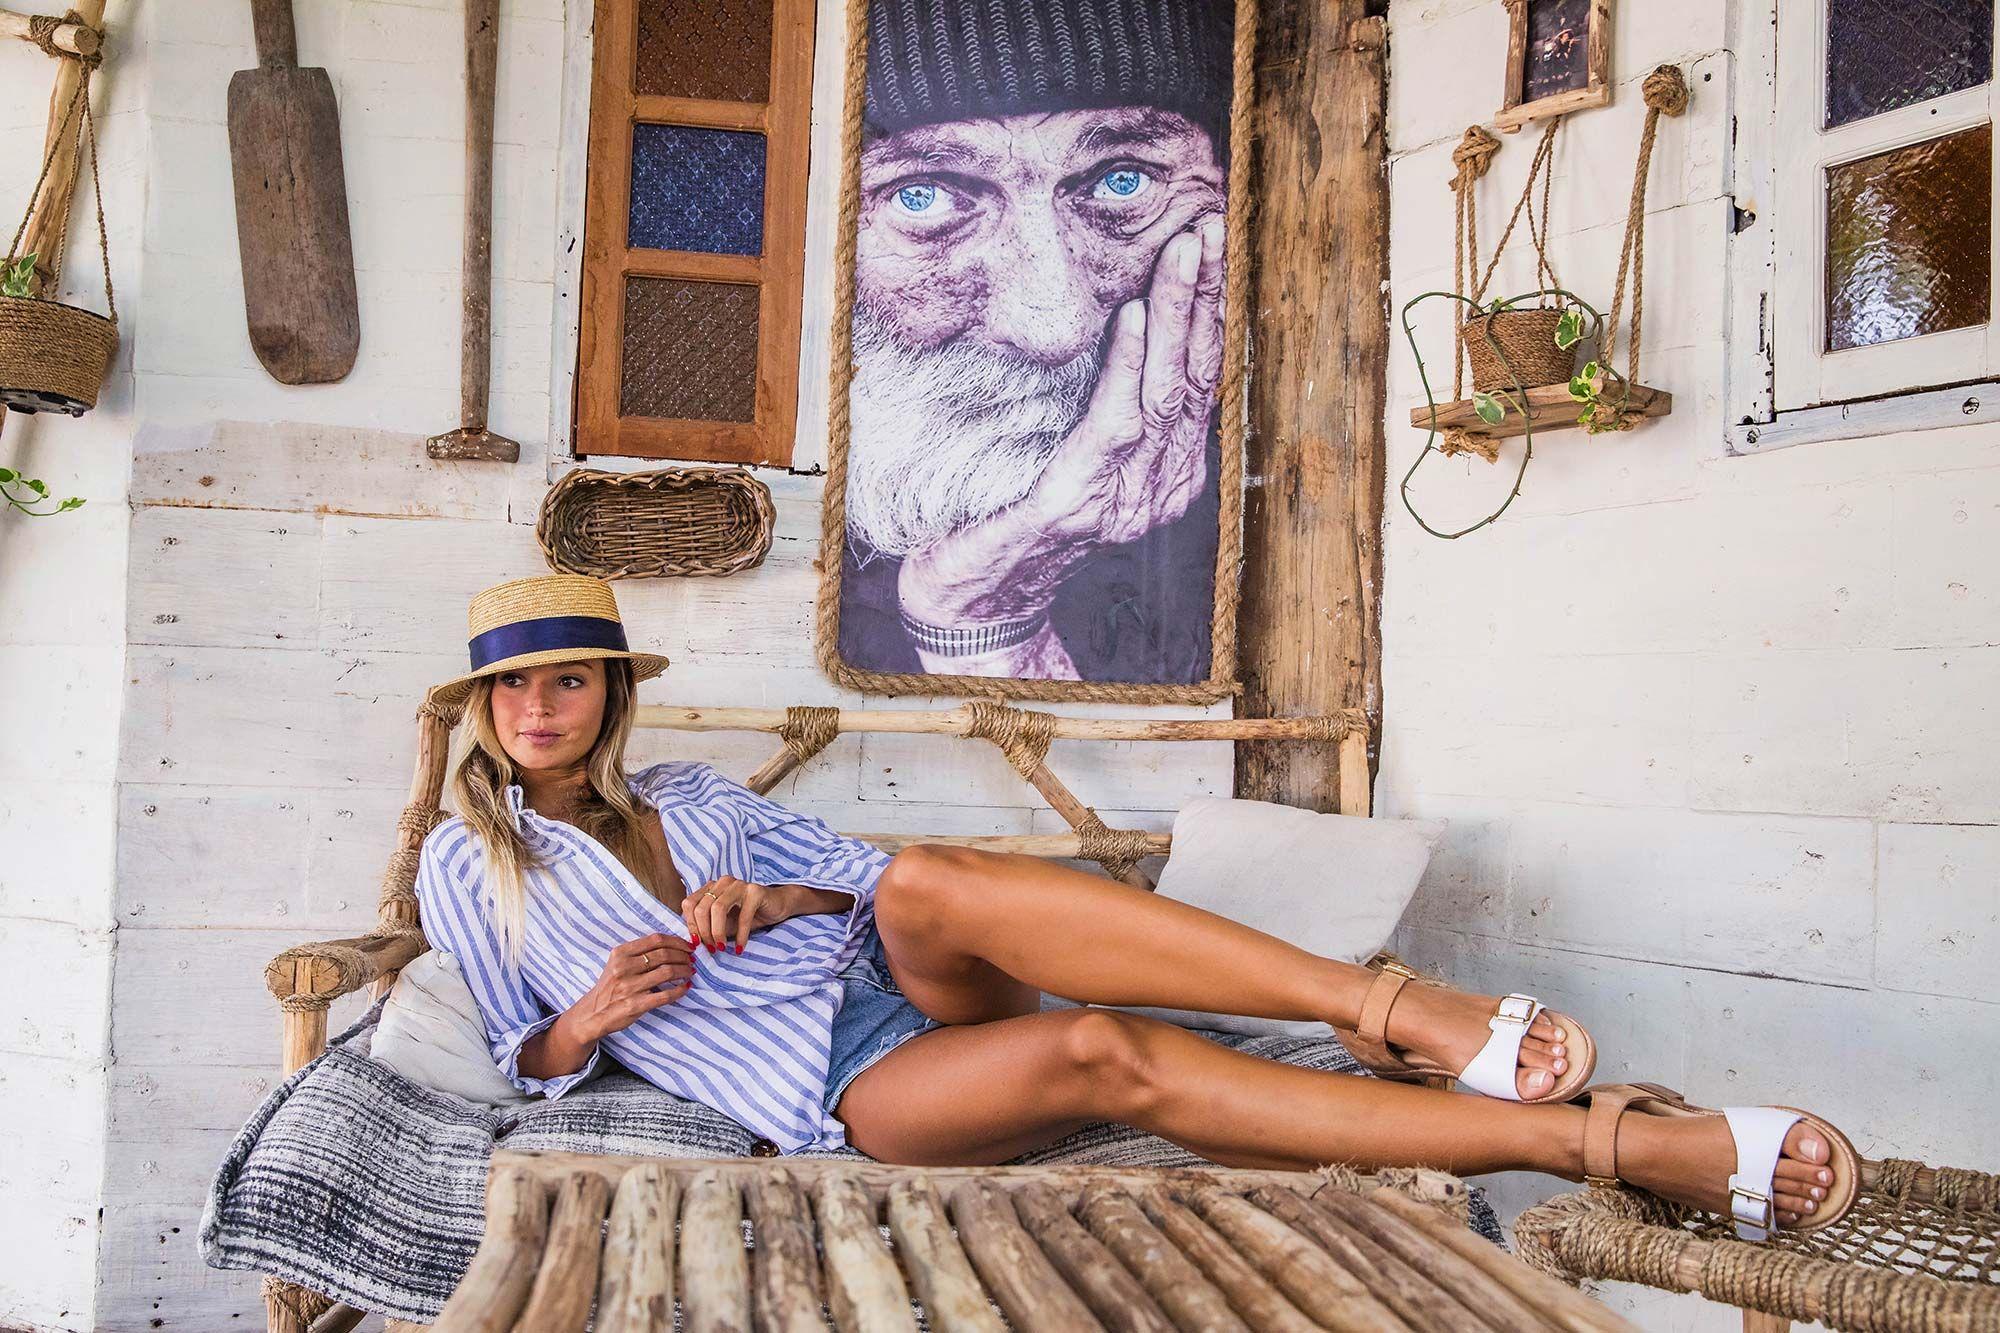 Bared_Footwear_La_Brisa_Bali_Travel_Summer_Womens_Campaign_Fantail_White_Tan_Leather_Sandals_